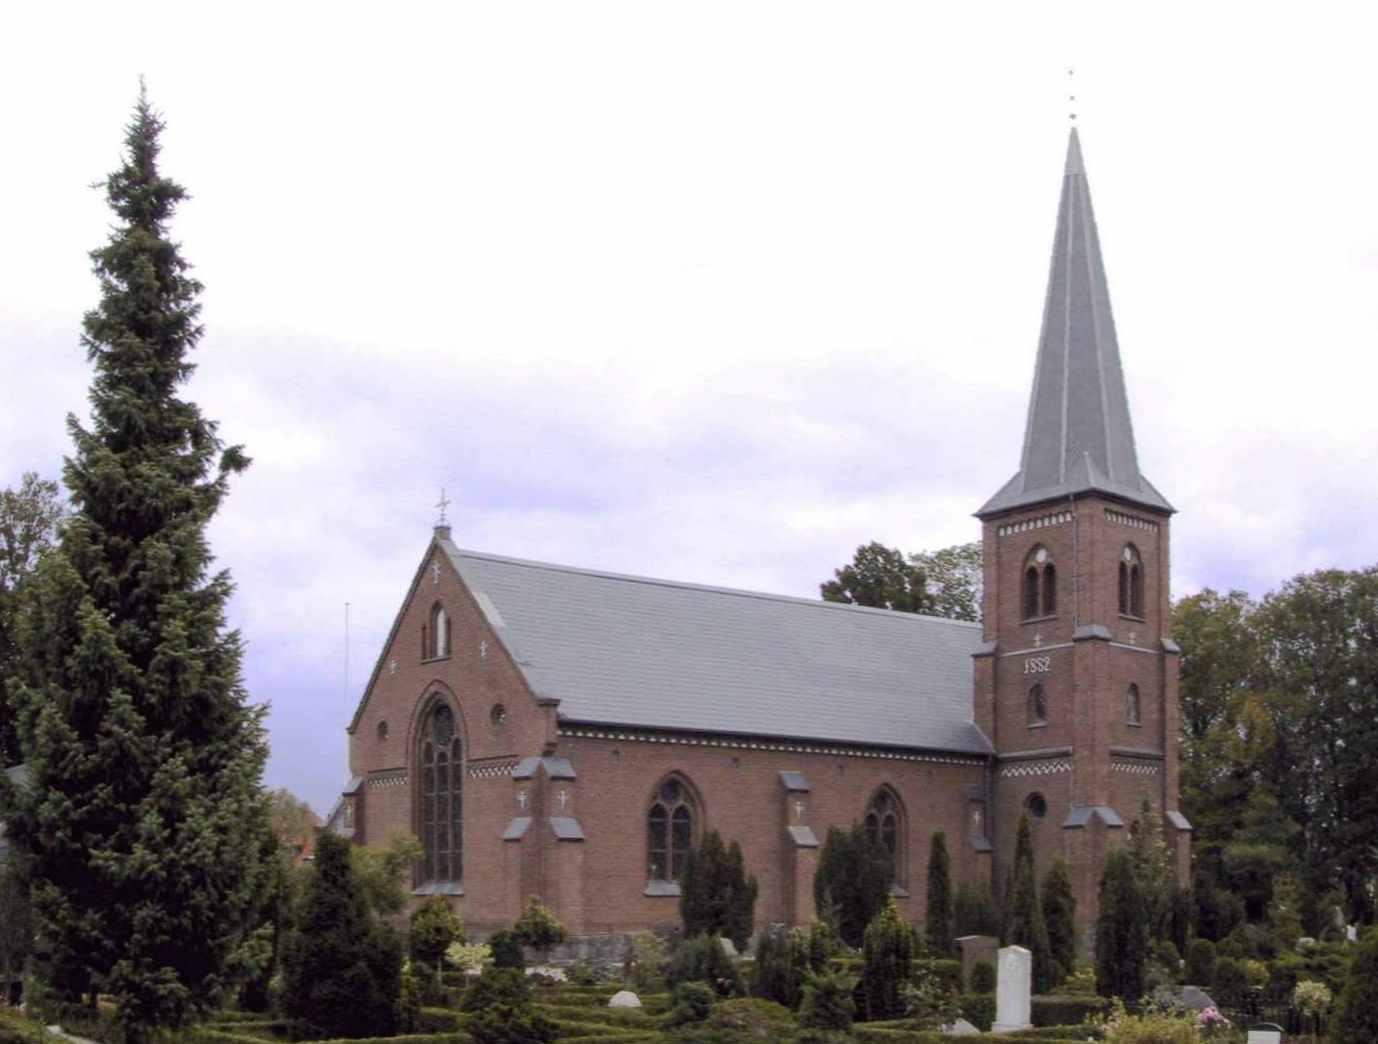 Dragør Kirke